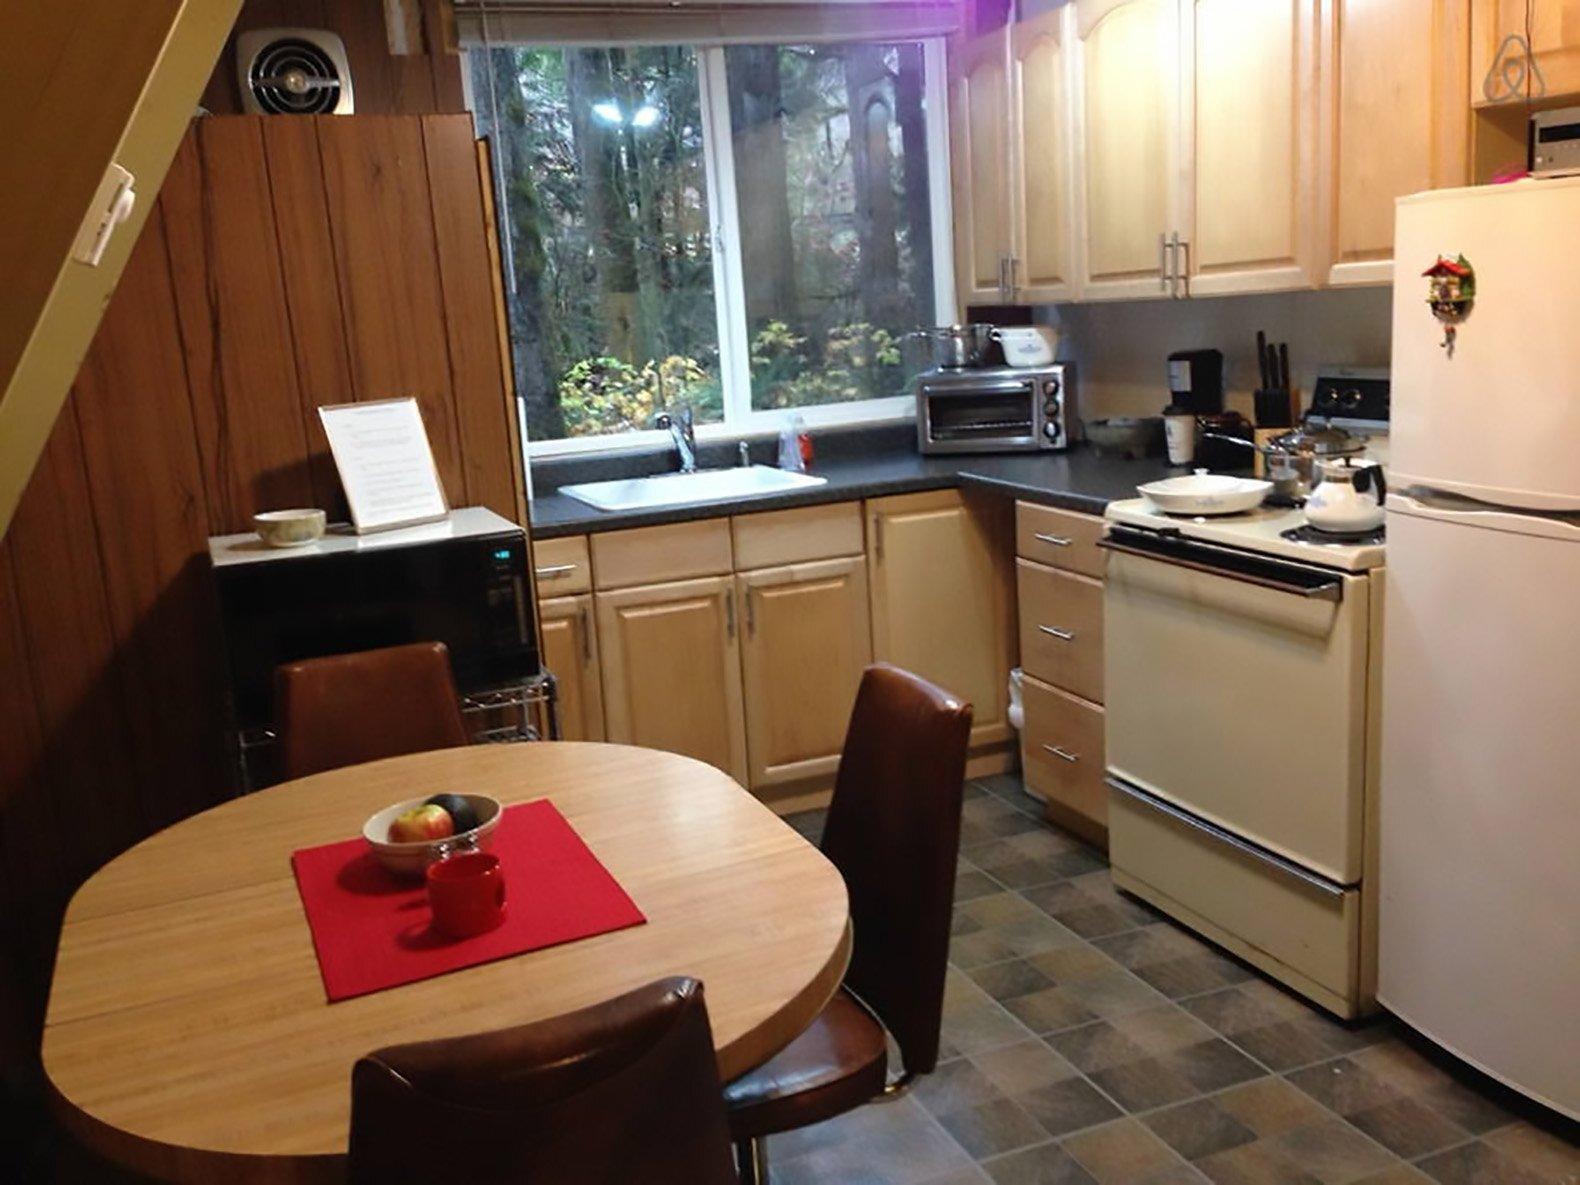 Tye-Haus A-Frame Cabin -  Skykomish Washington - Kitchen - Humble Homes